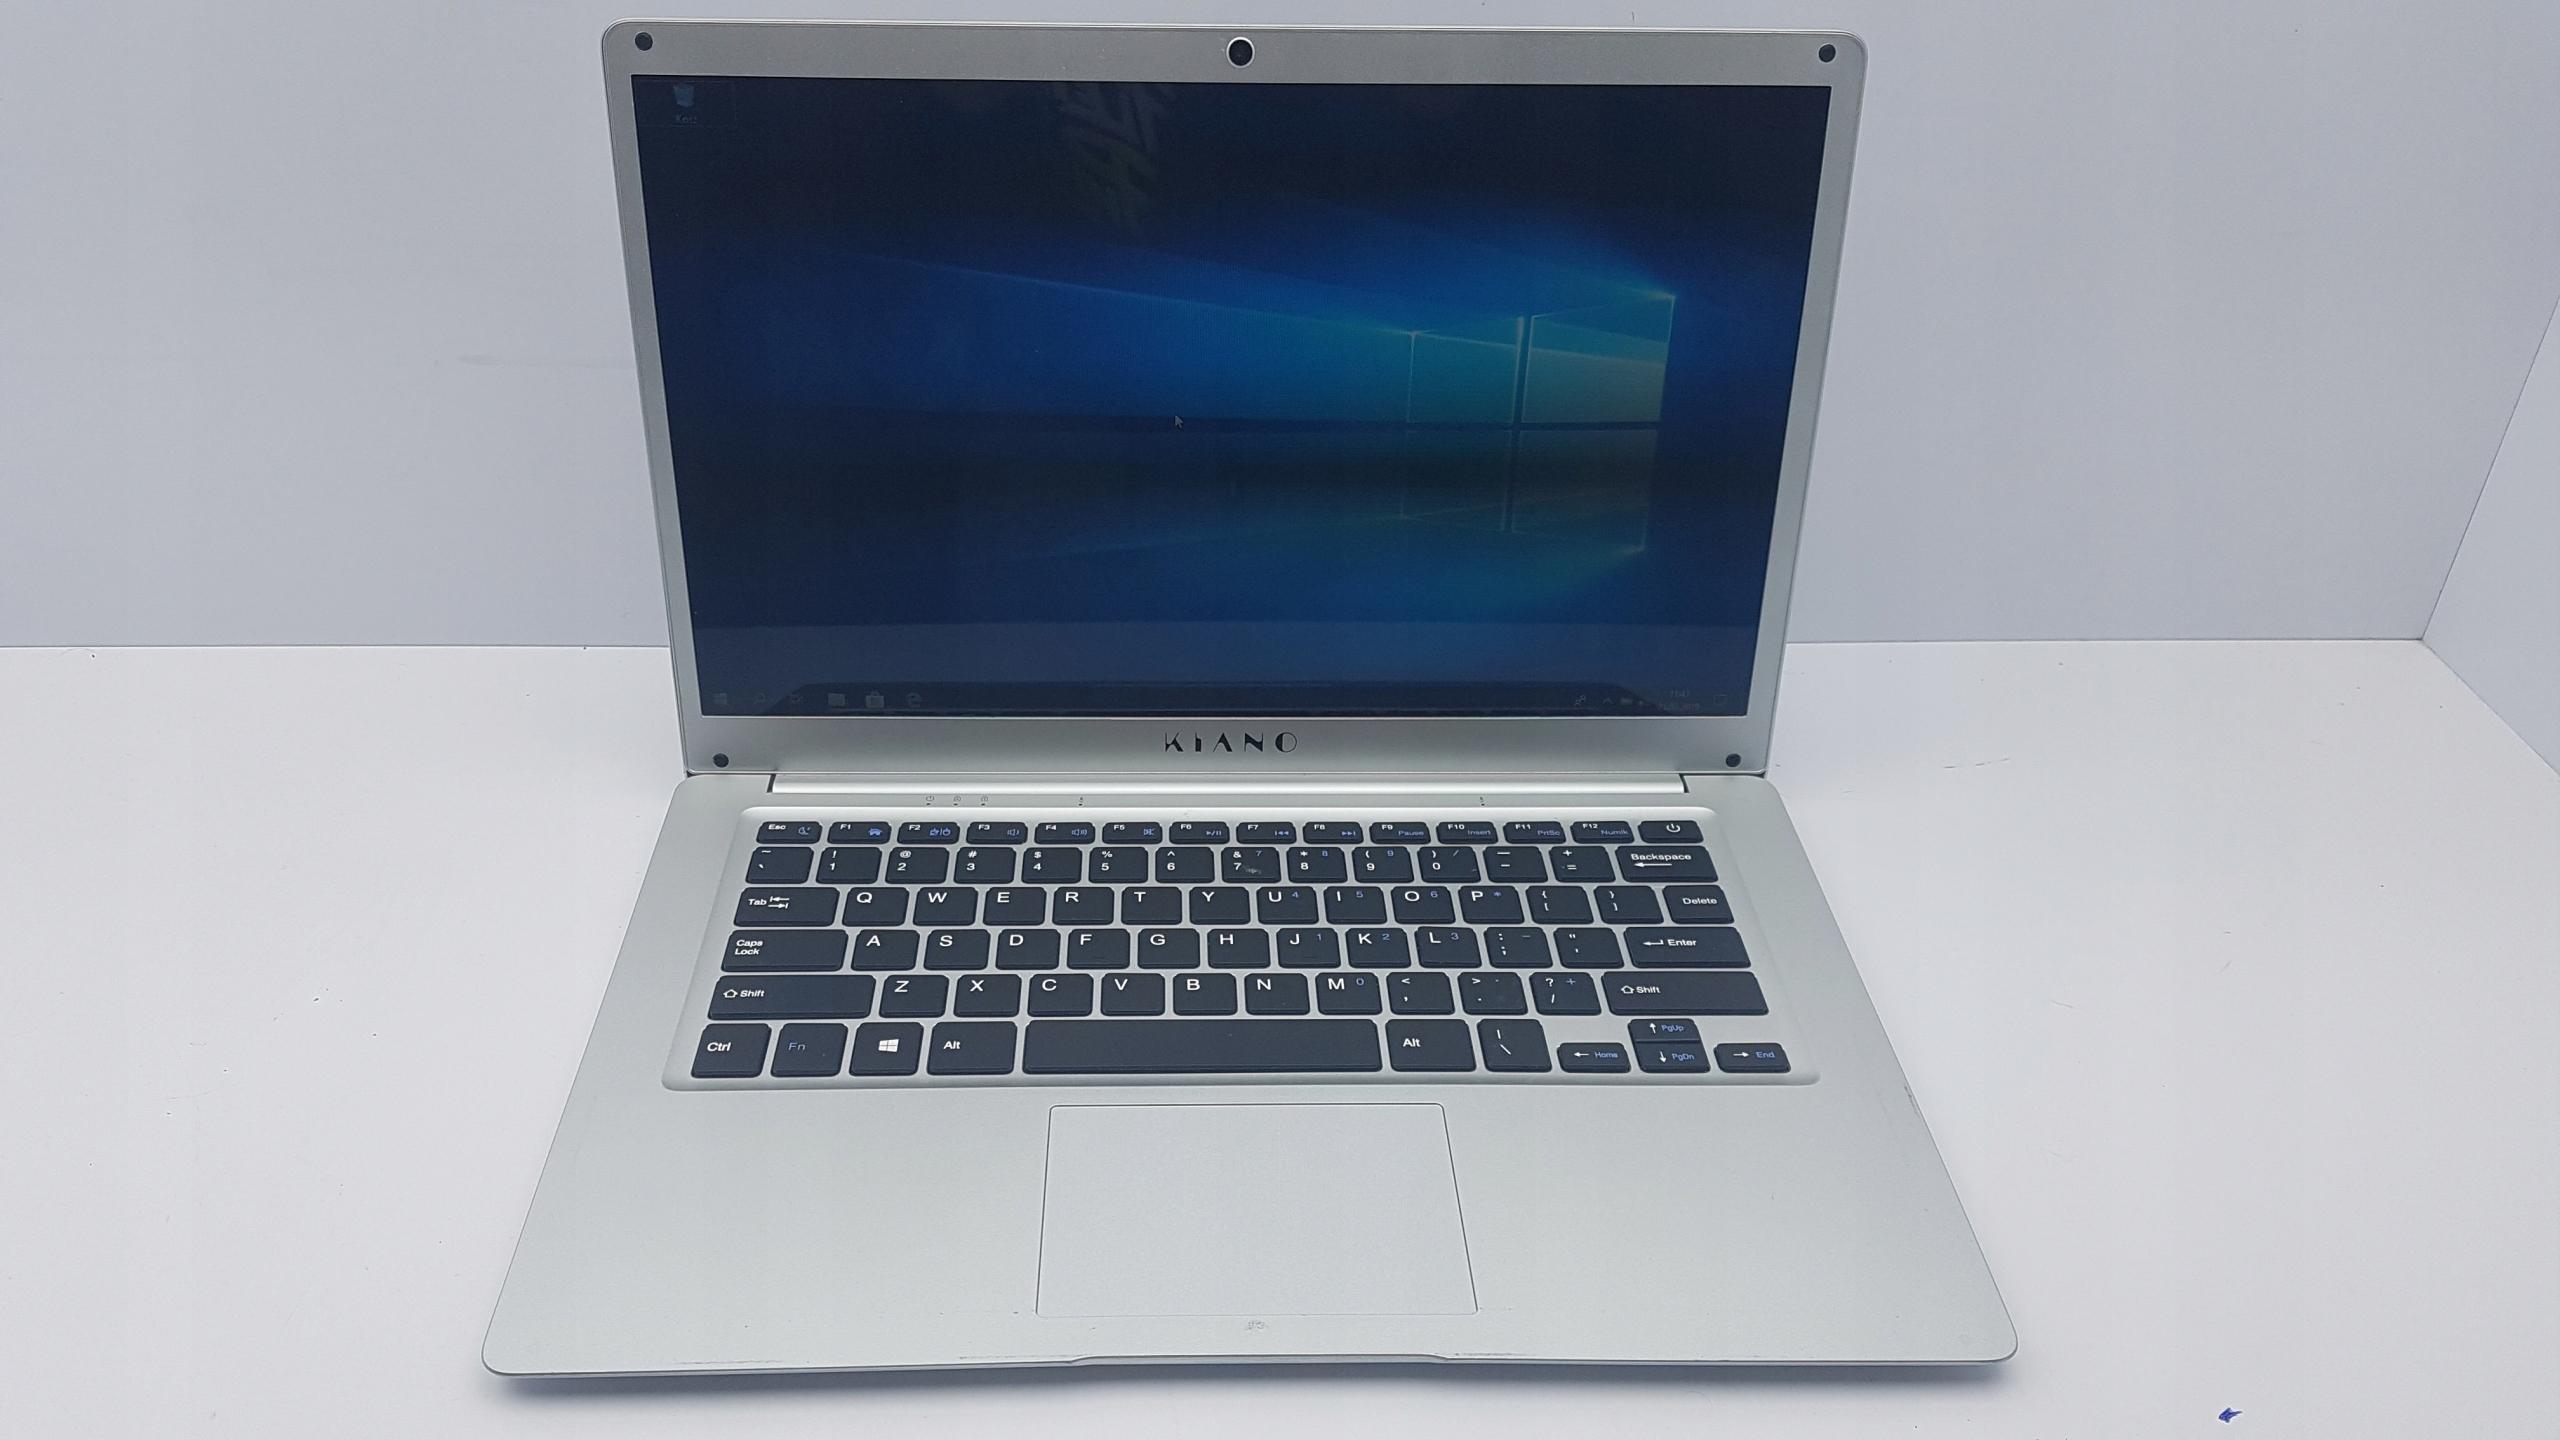 Notebook Kiano SlimNote 14.2 Lombard66